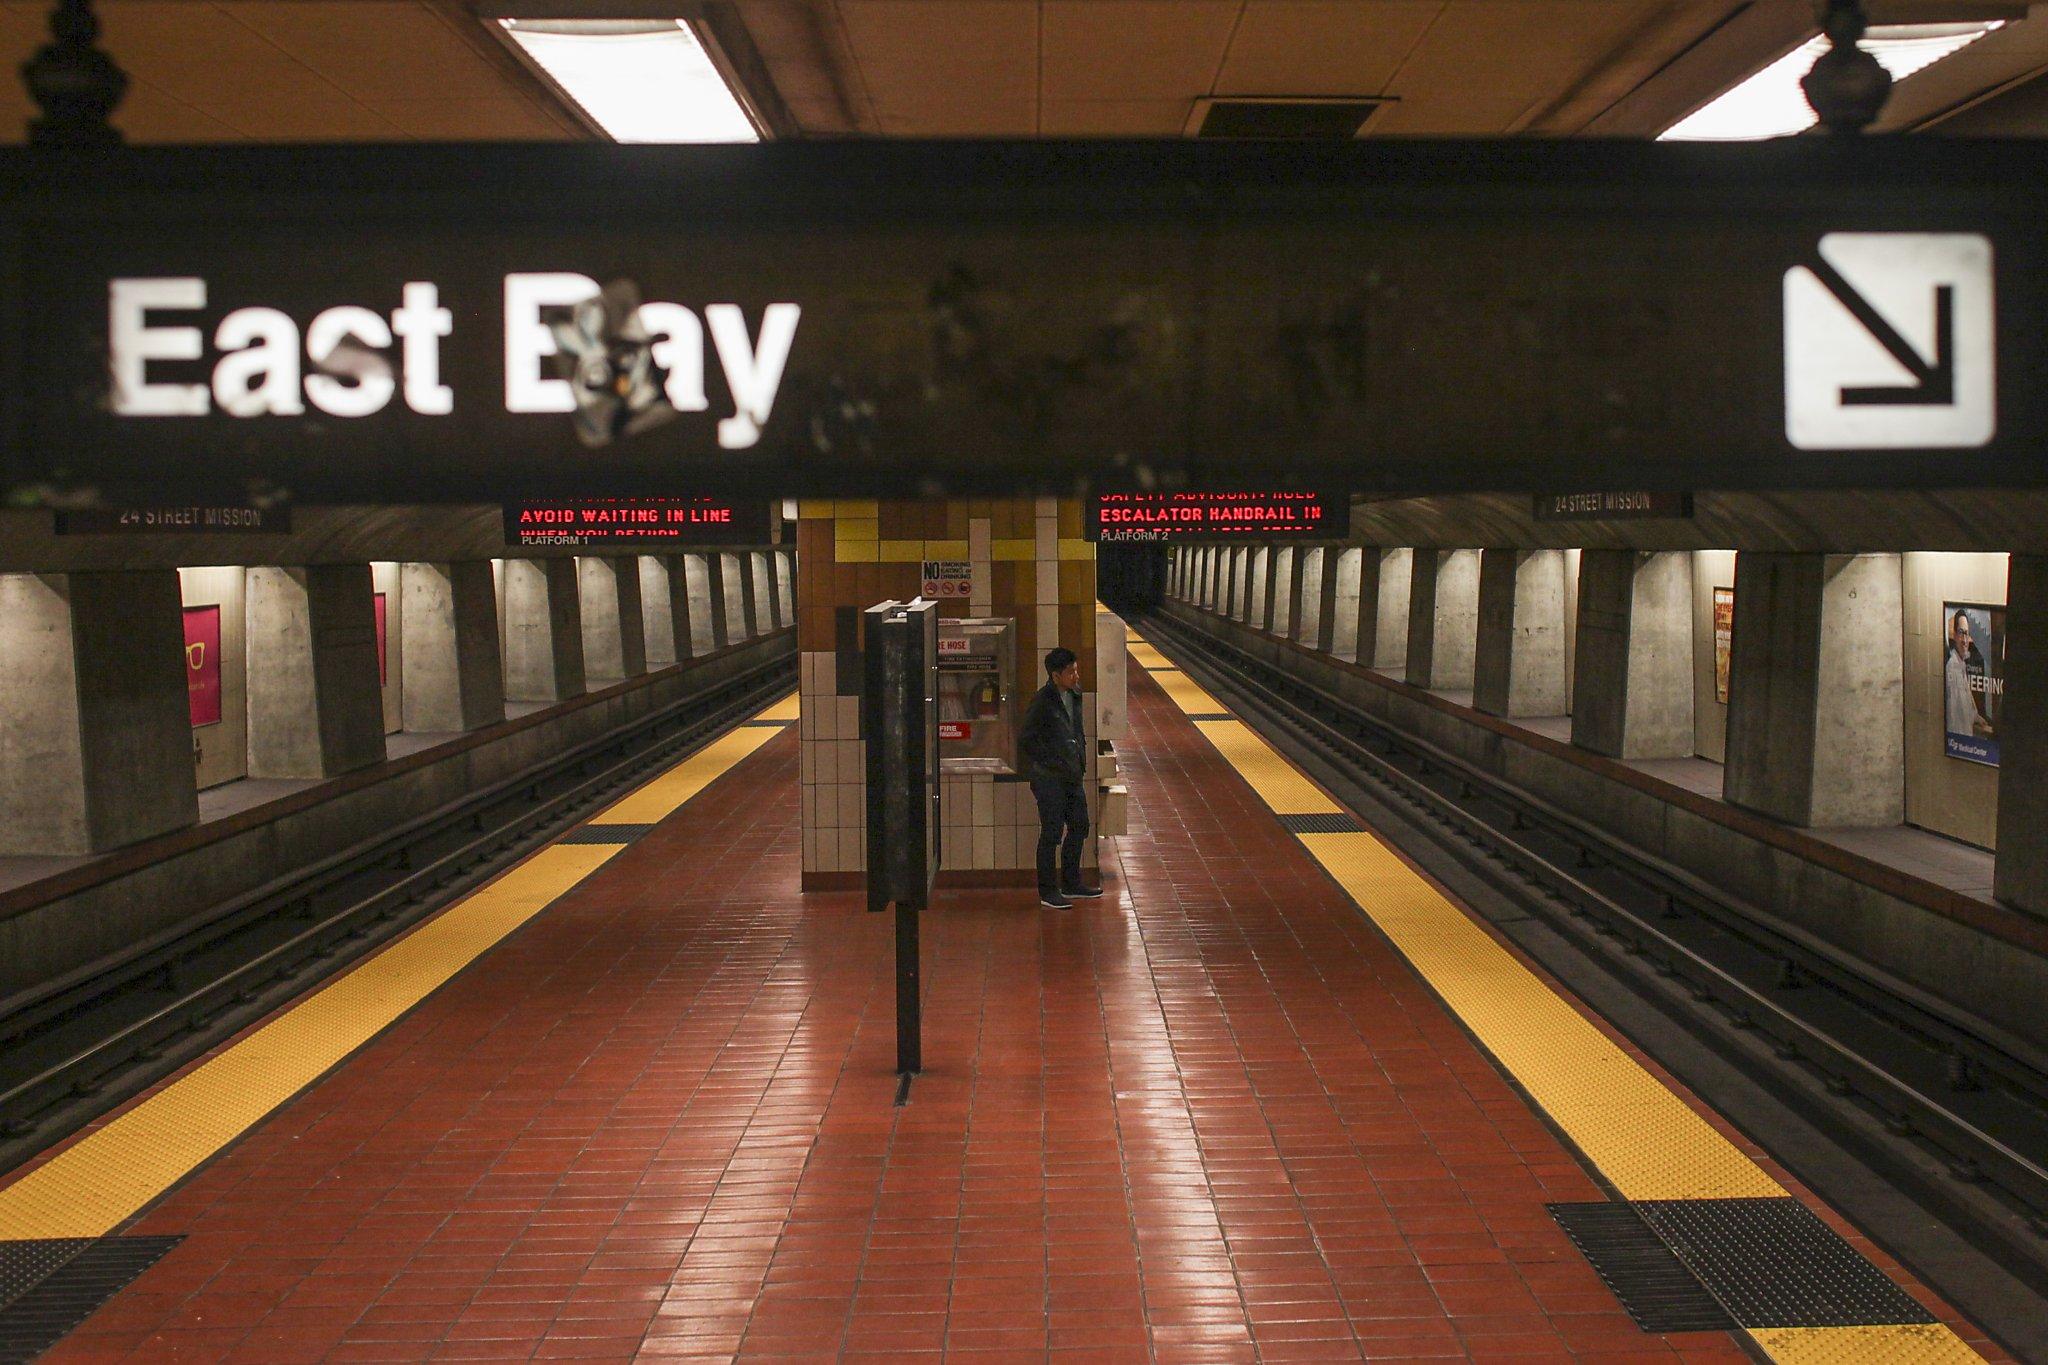 Smoldering debris causes major BART delays systemwide | San Francisco Gate